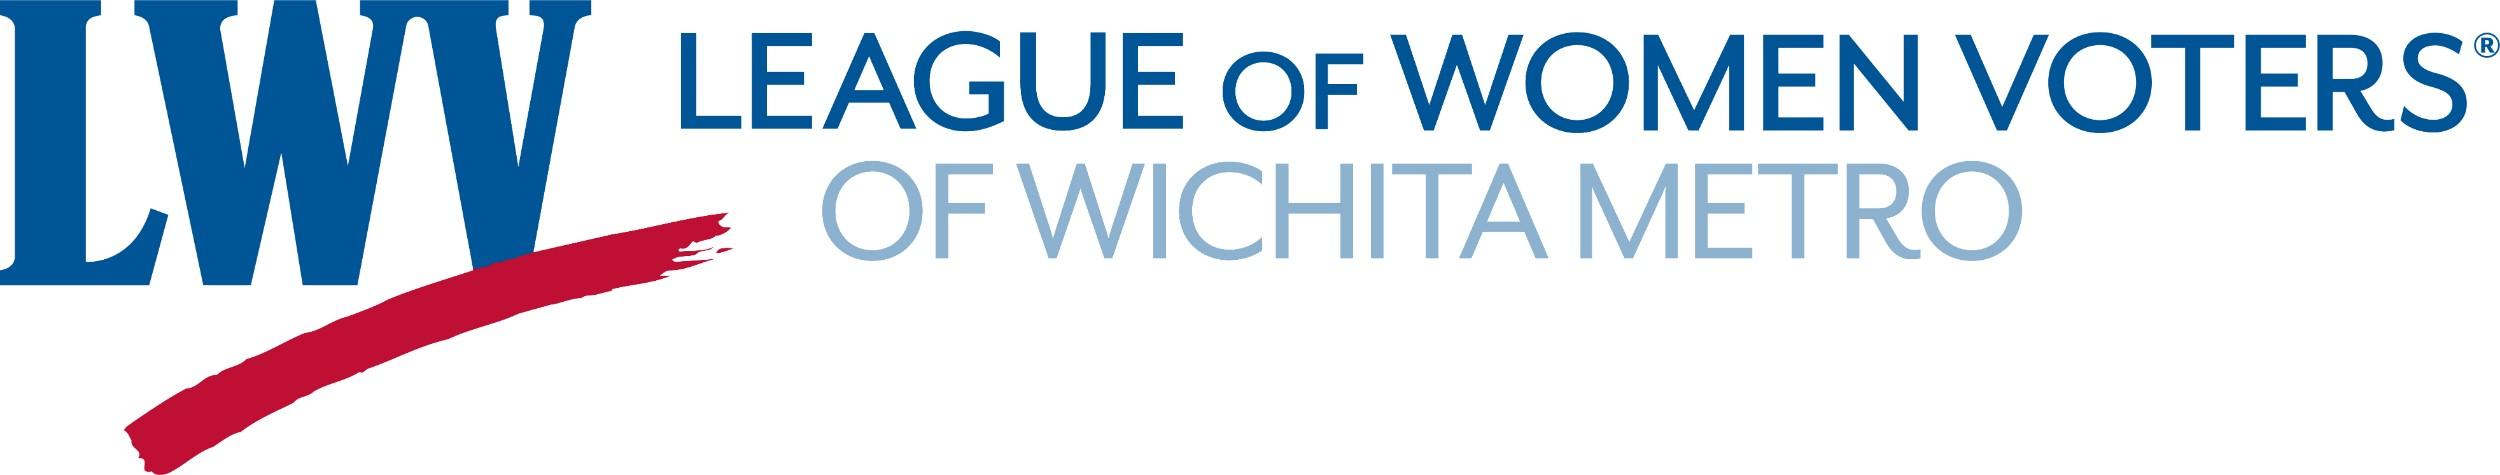 League of Women Voters of Wichita Metro